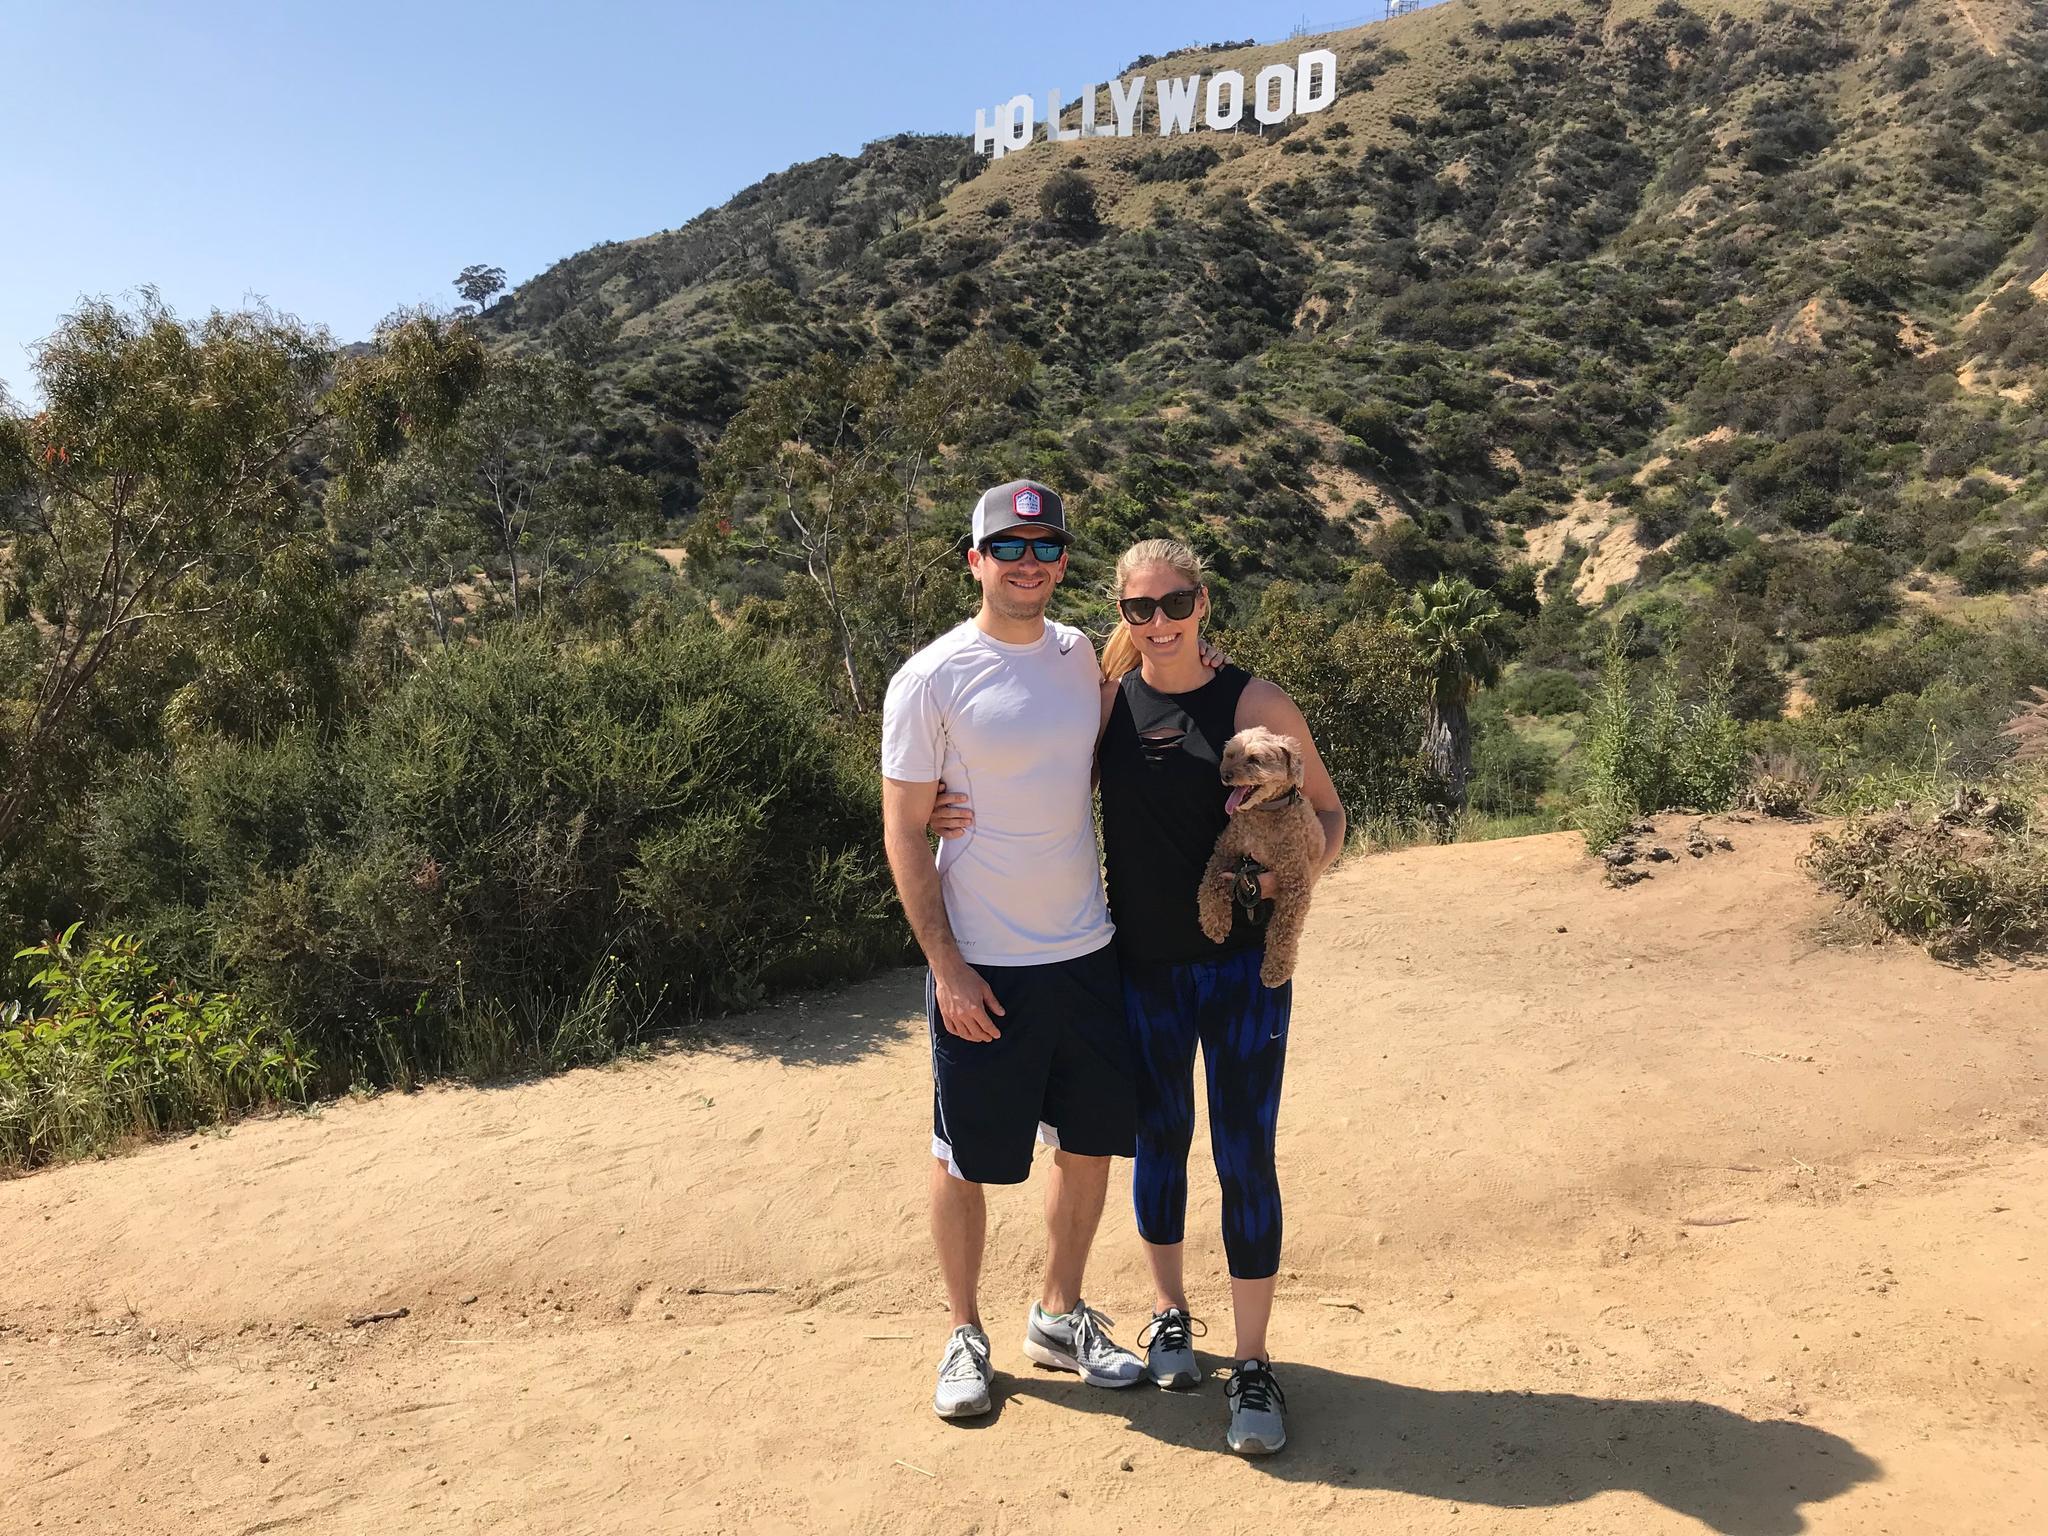 Hollywood Hills, April 2018